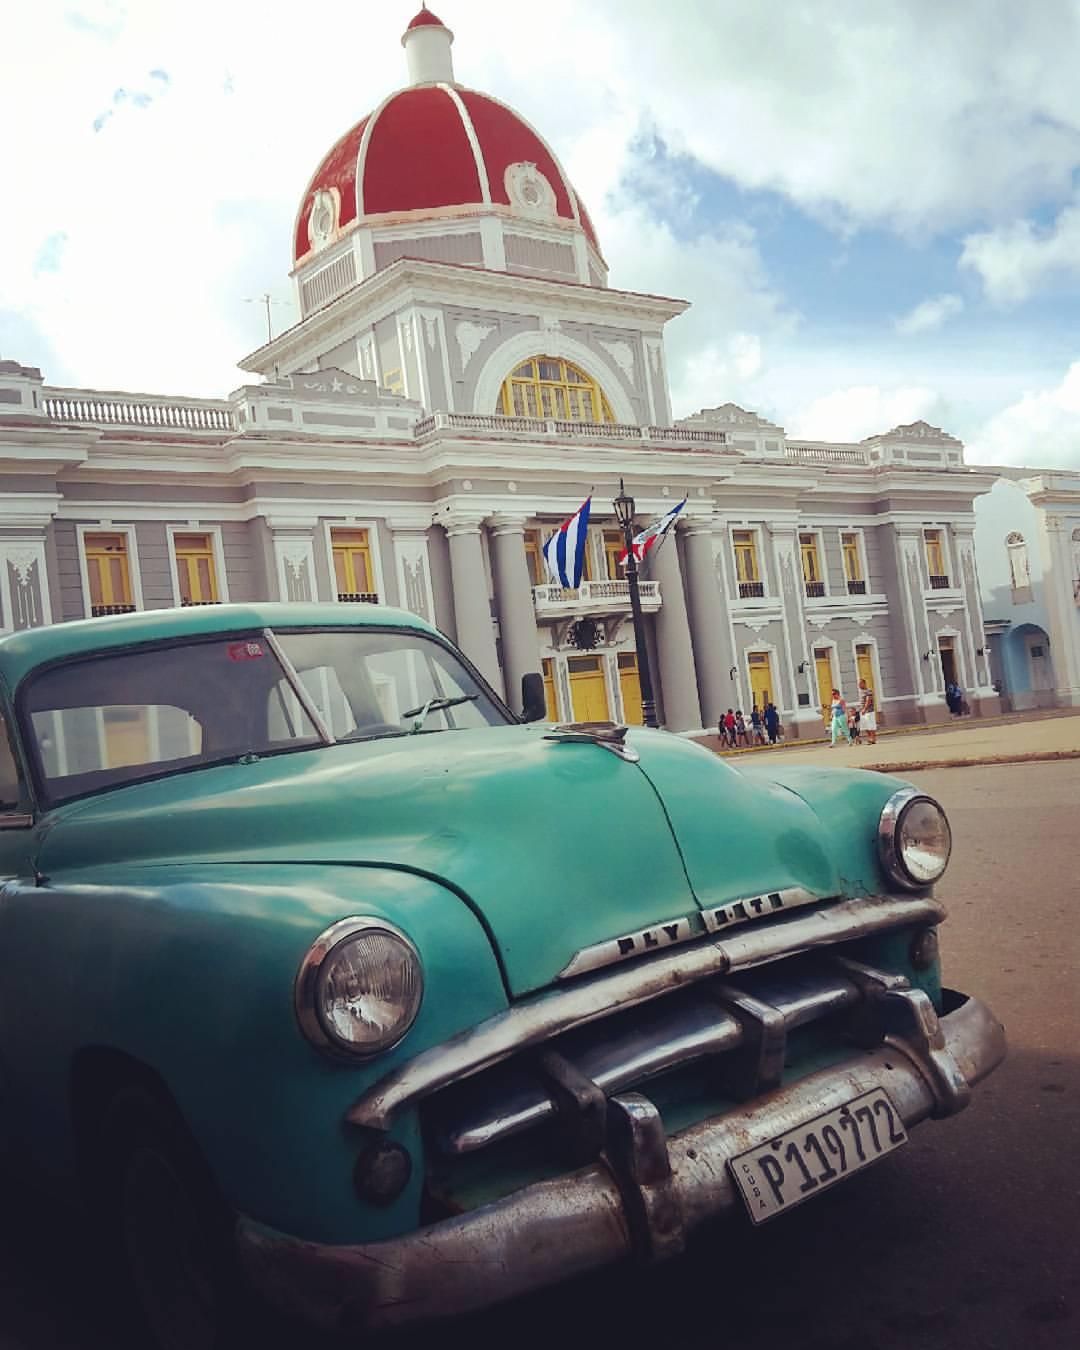 Cuba in Photographs